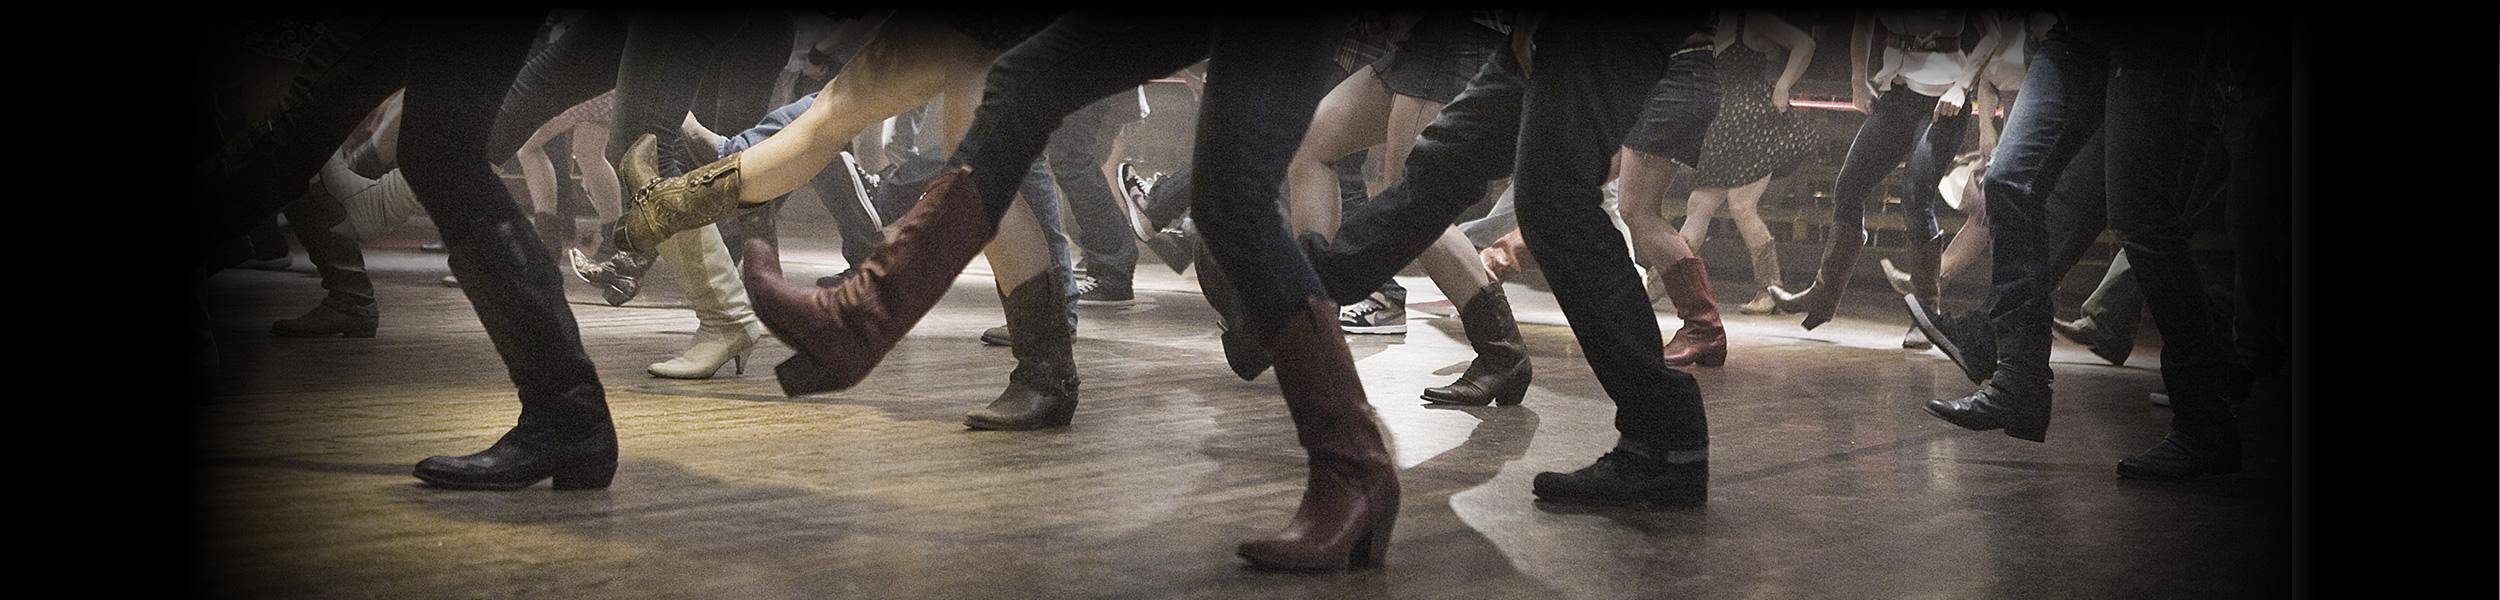 The Stockyard - Line Dance Lessons